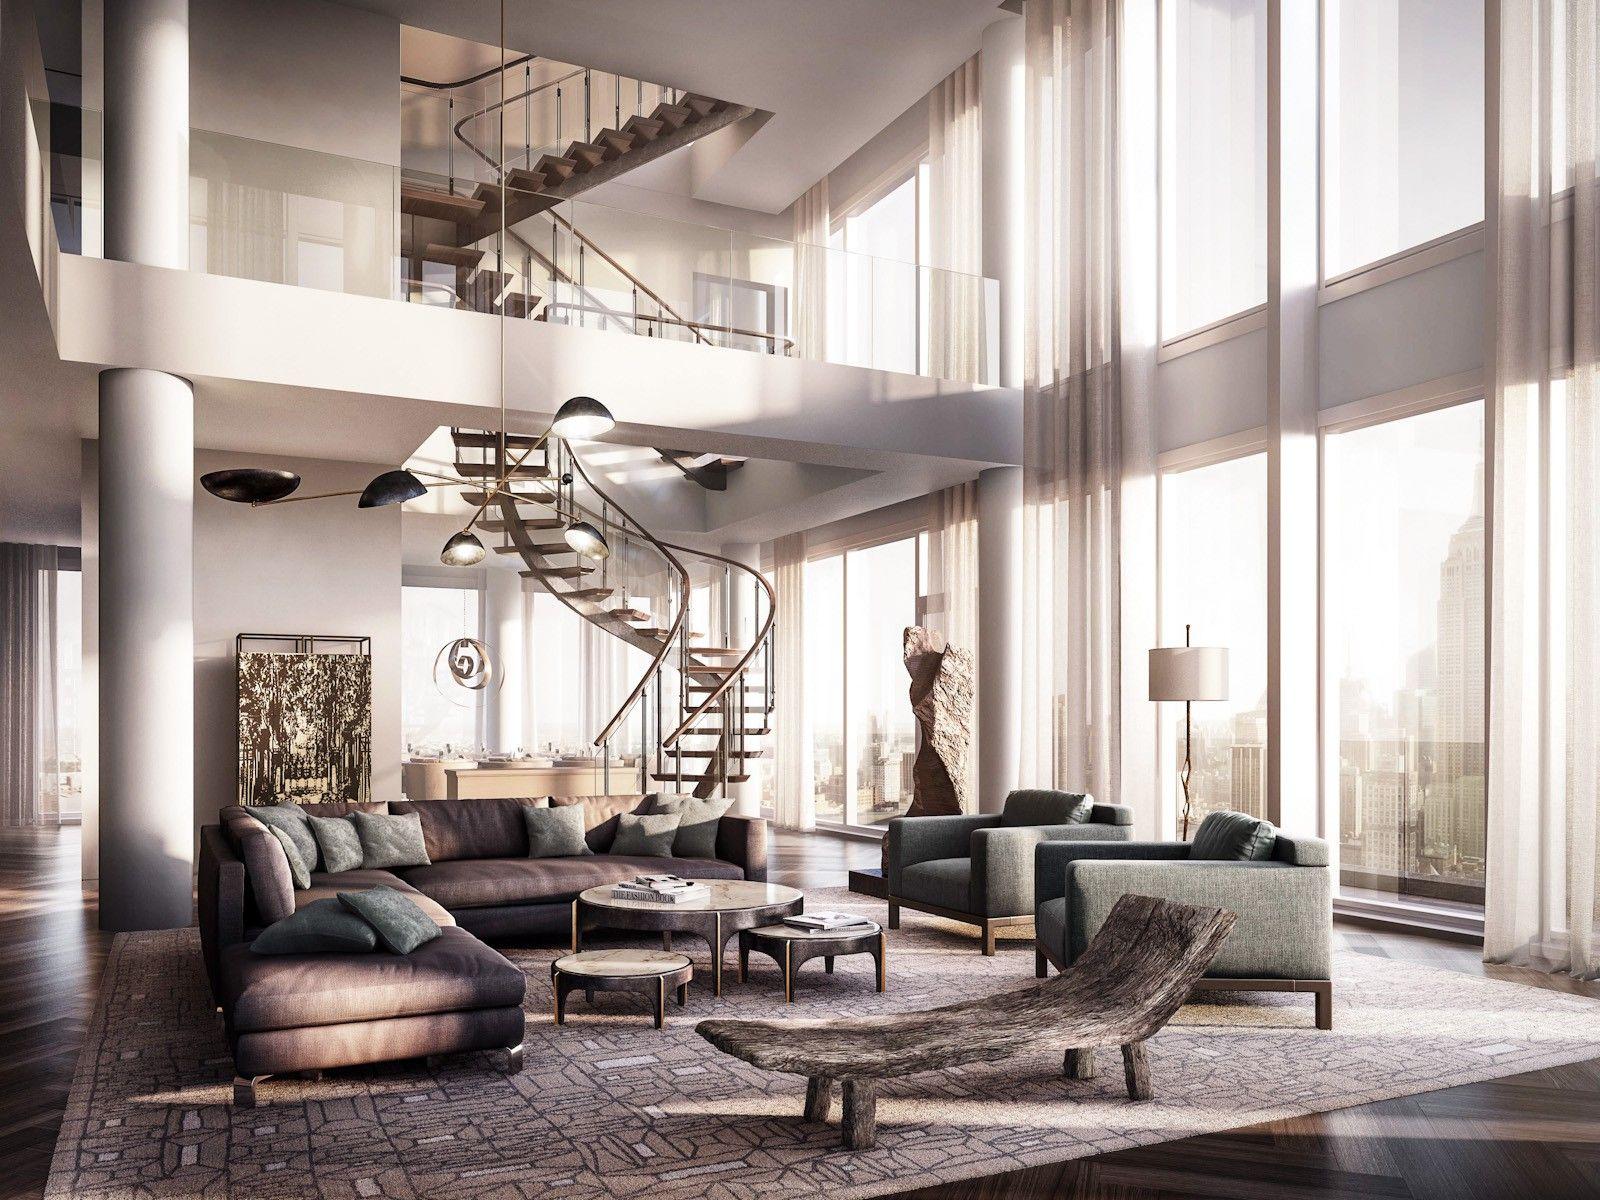 The World's Most Lavish High-rise Apartments - Billionaire